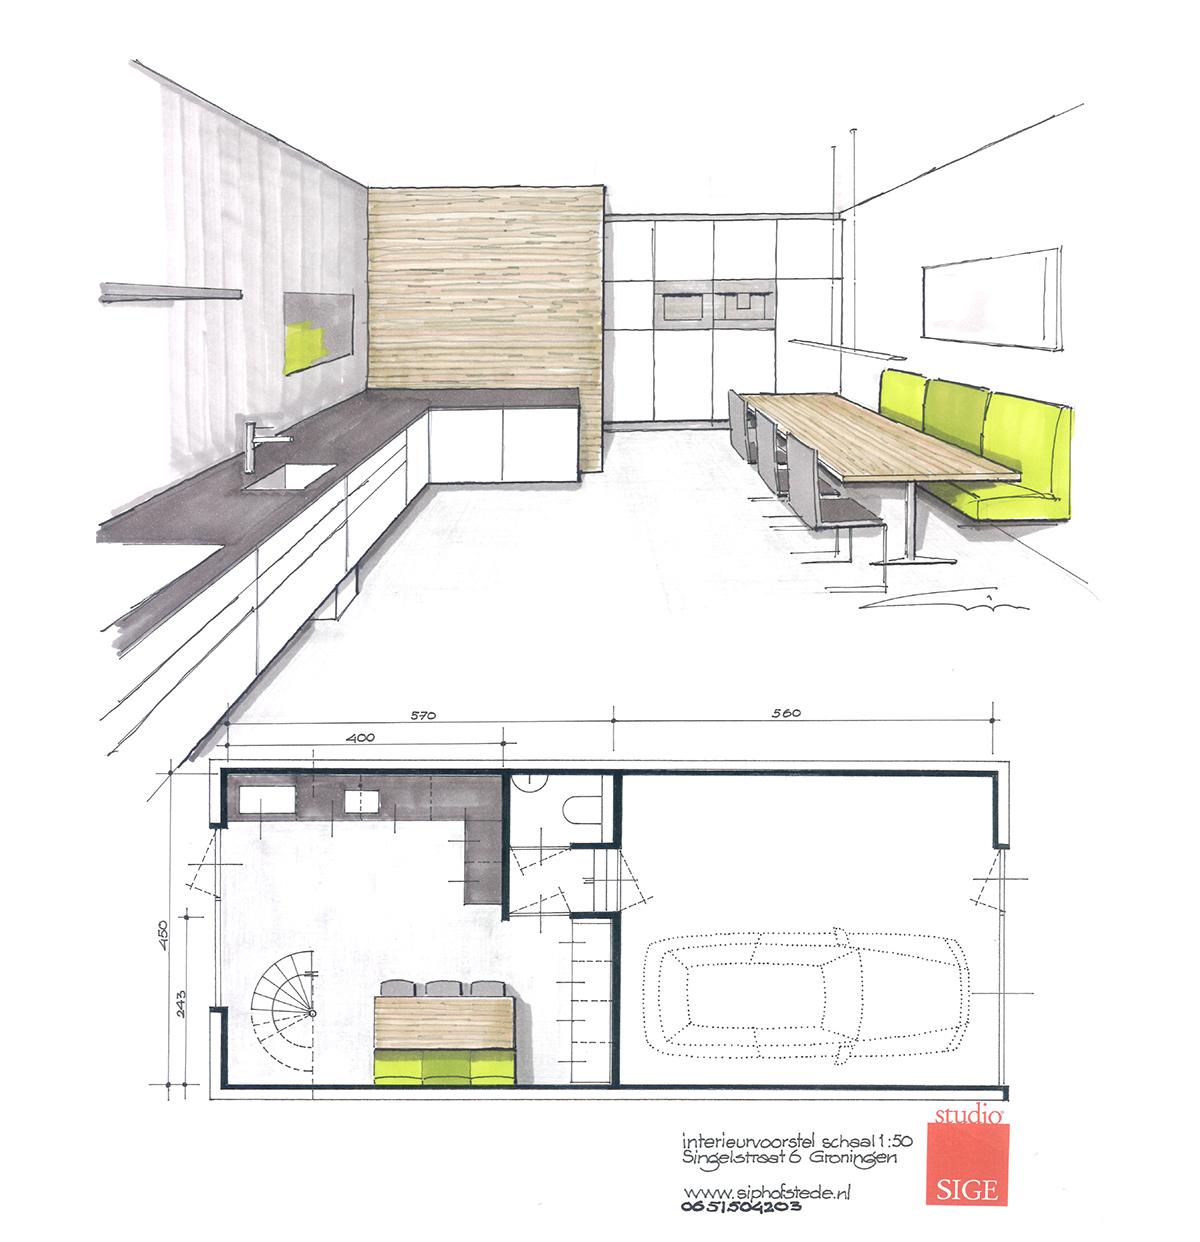 Sip hofstede interieur ontwerpen for Interieur ontwerpen